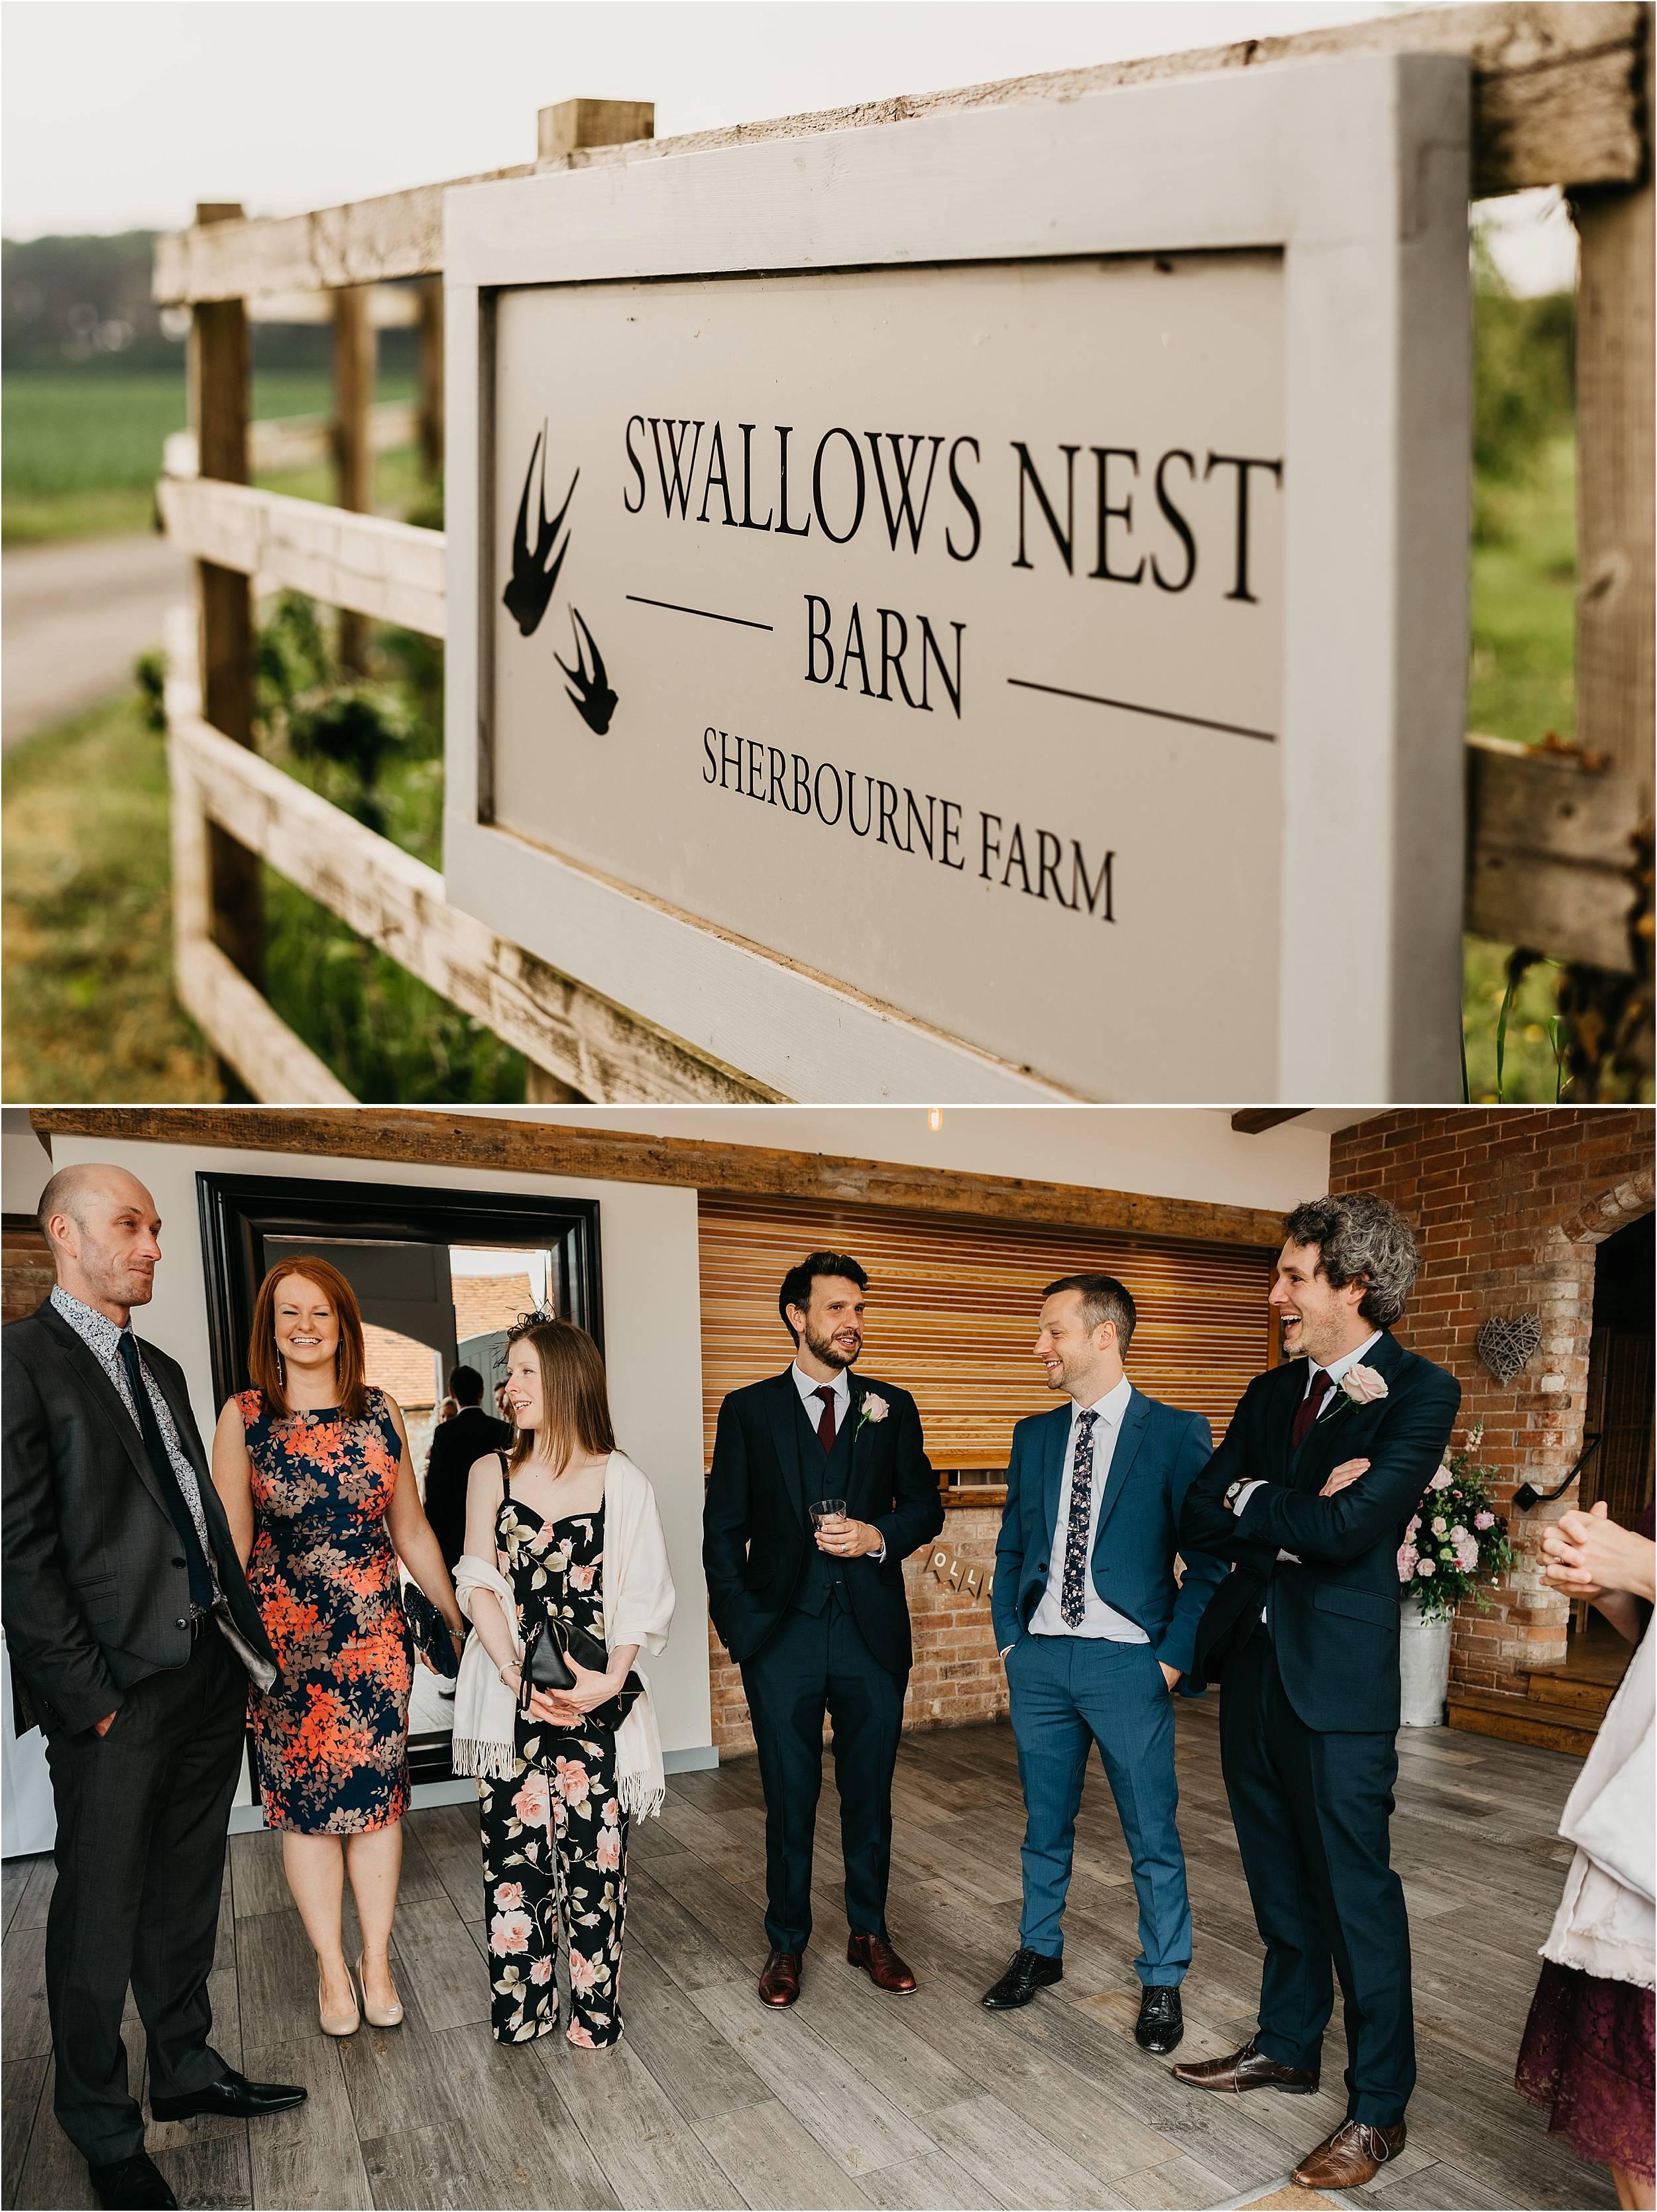 Swallows Nest Barn Wedding Photography_0133.jpg